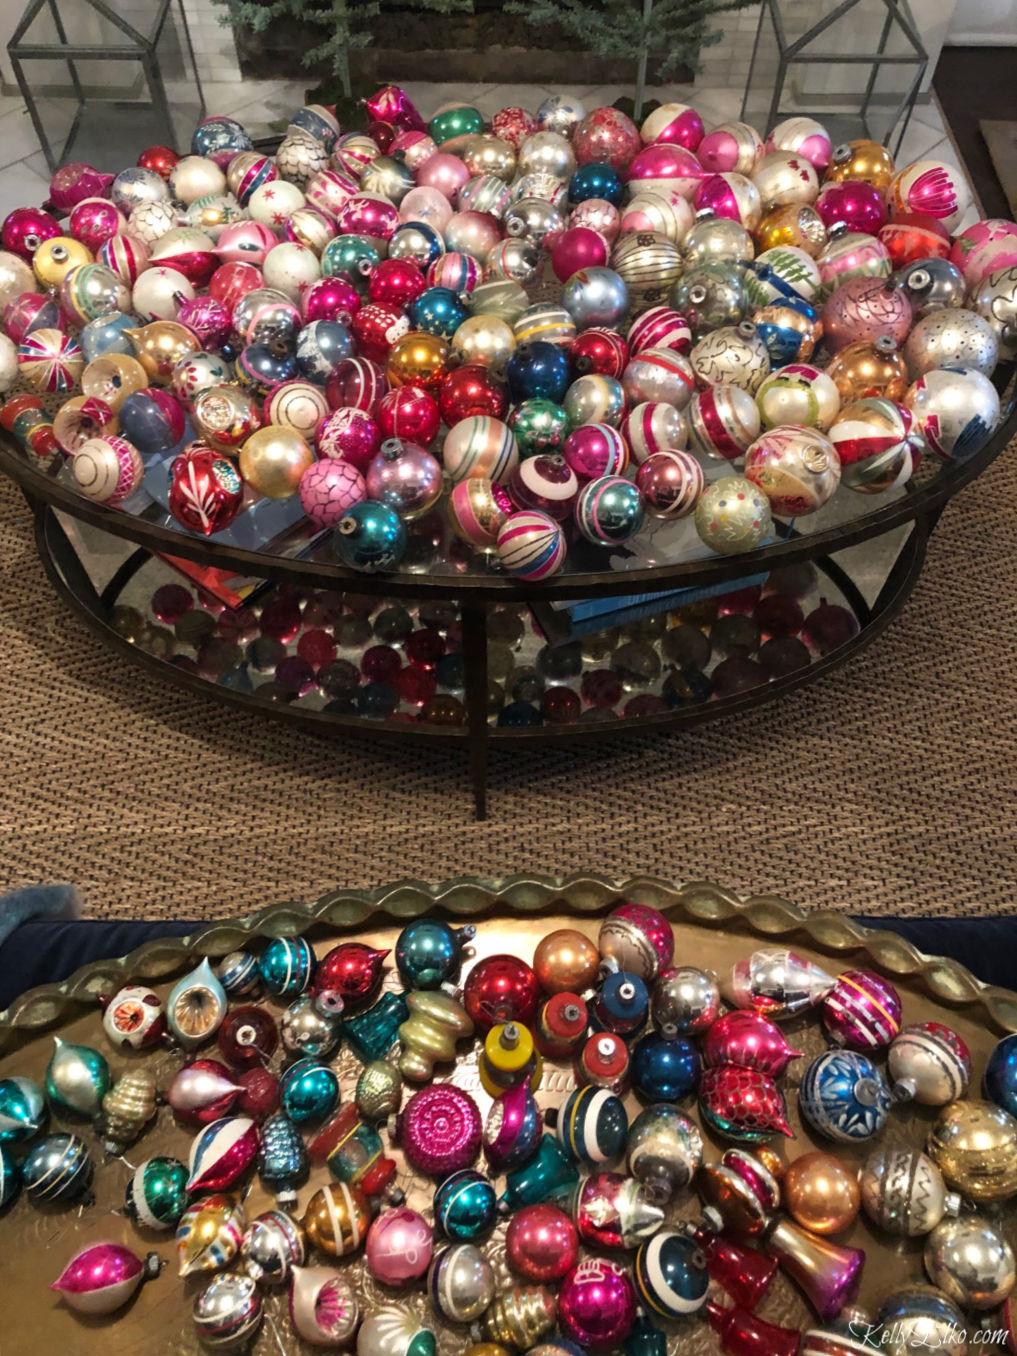 Huge collection of vintage Shiny Brite Christmas ornaments kellyelko.com #shinybrites #vintagechristmas #vintageornaments #shinybrite #christmasdecor #kellyelko